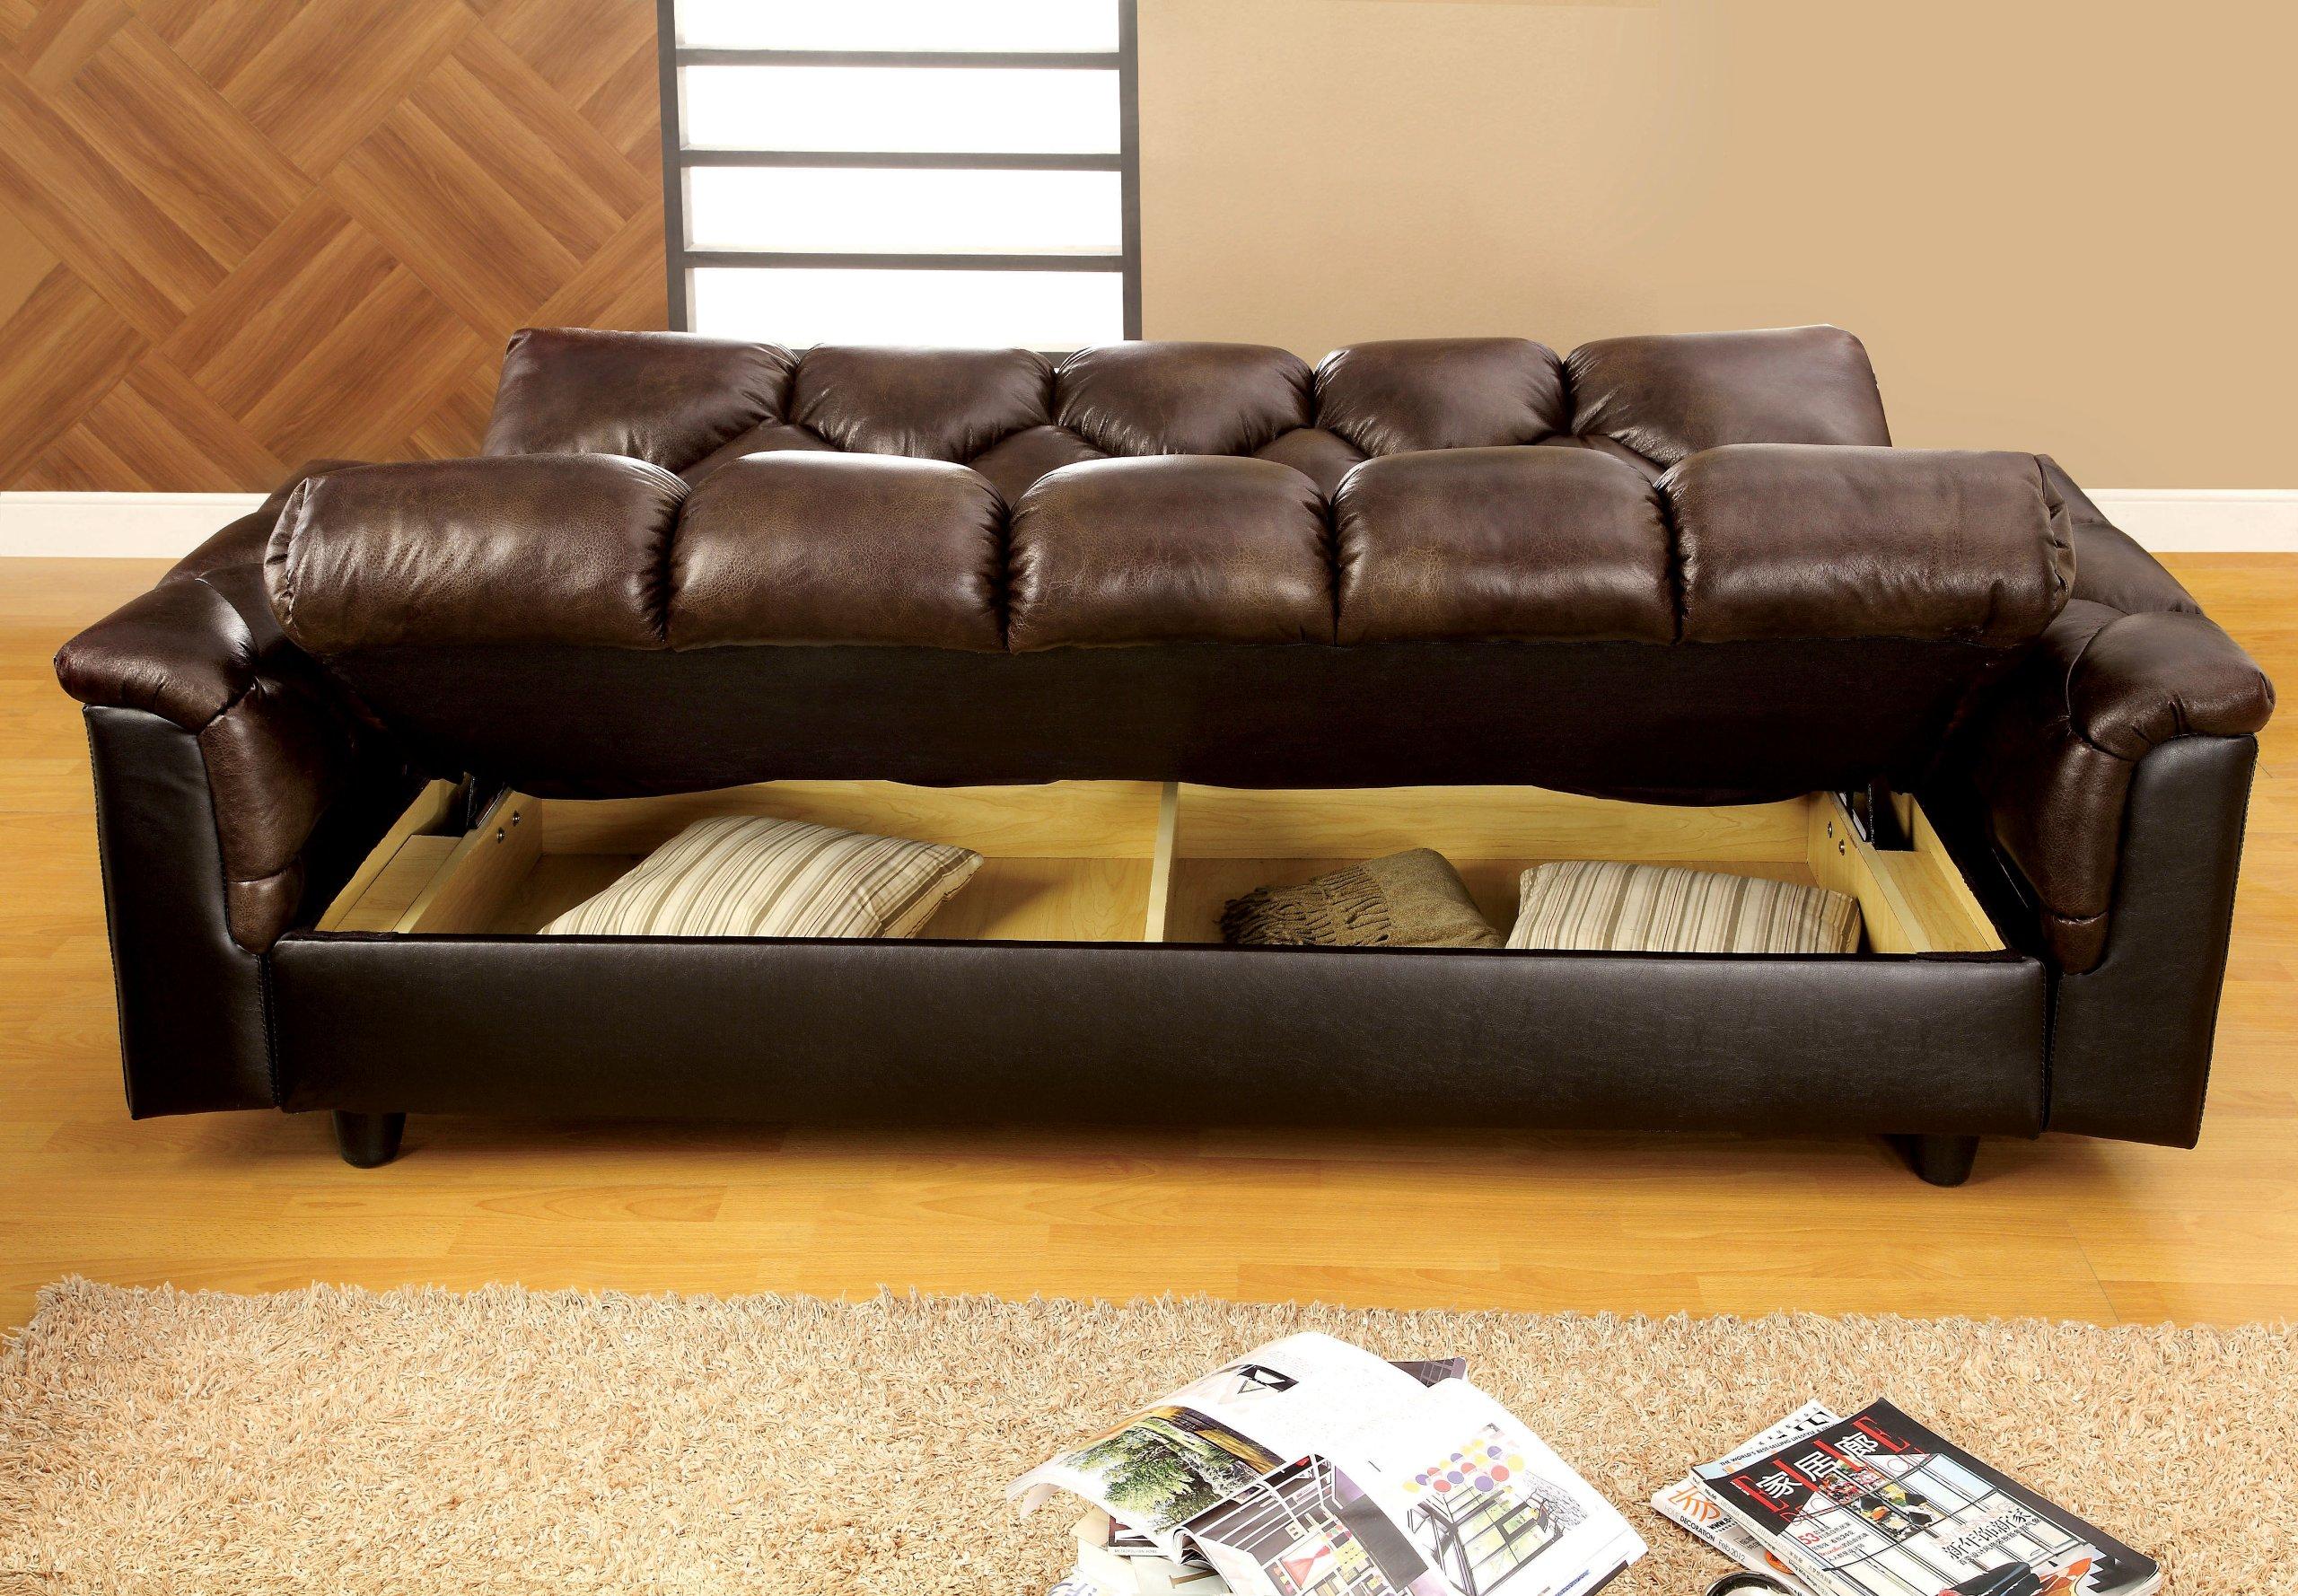 Furniture of America Montclaire Leather Vinyl Storage Futon